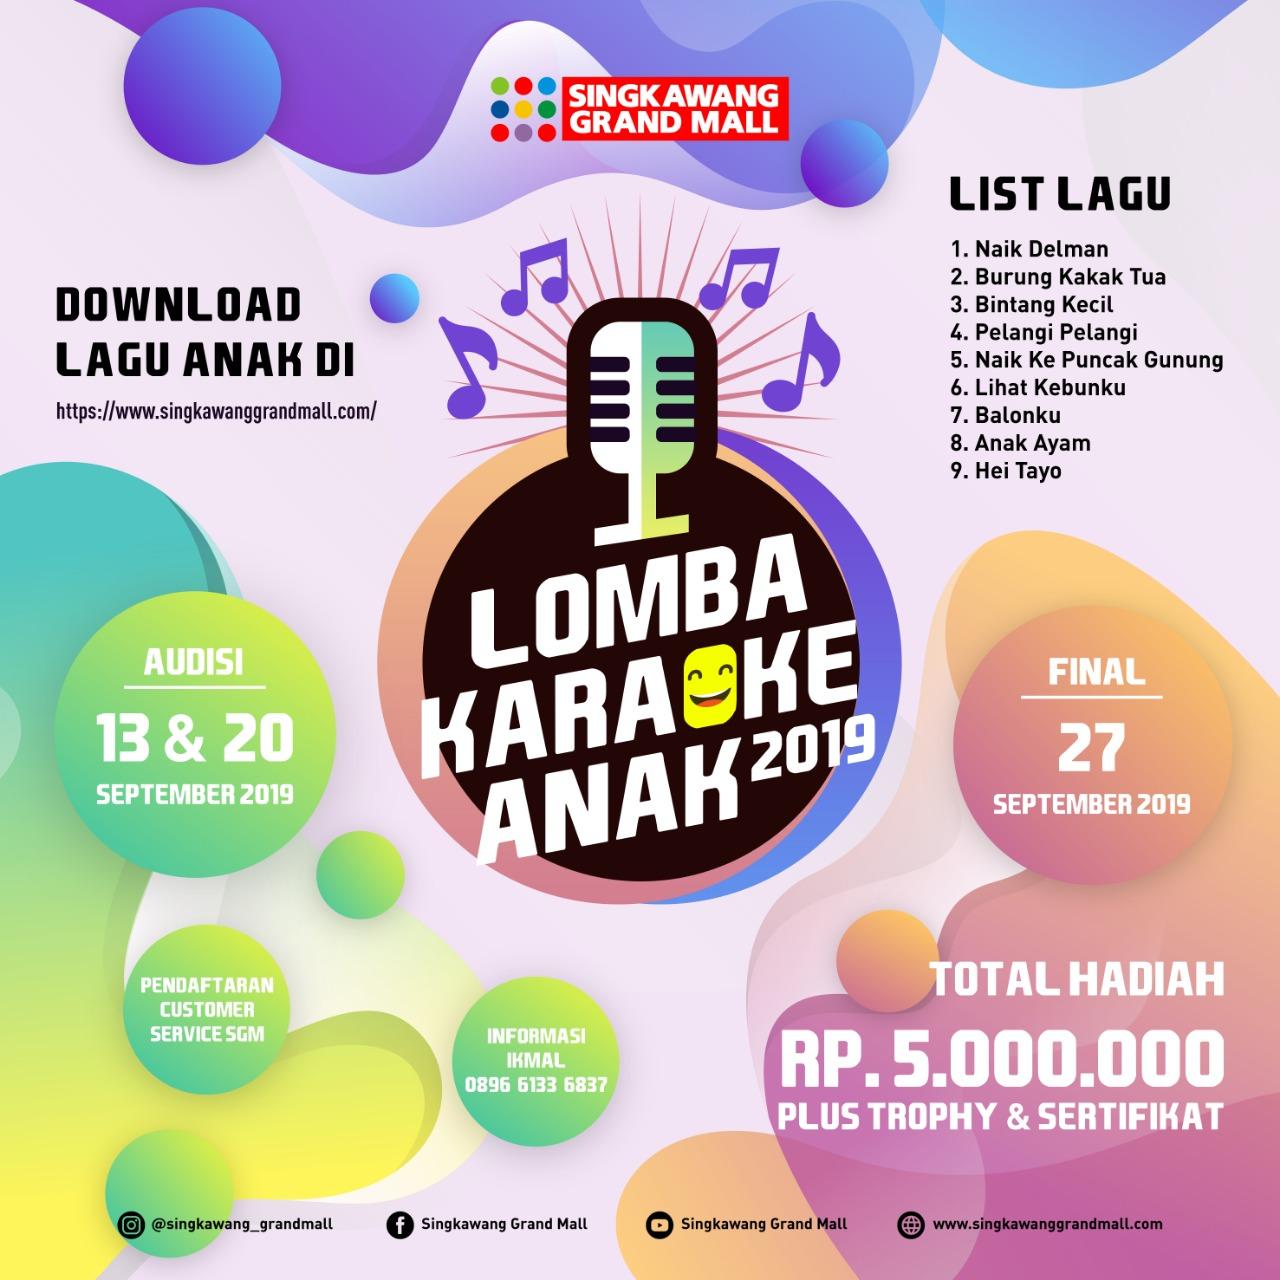 Lomba Karaoke Anak 2019